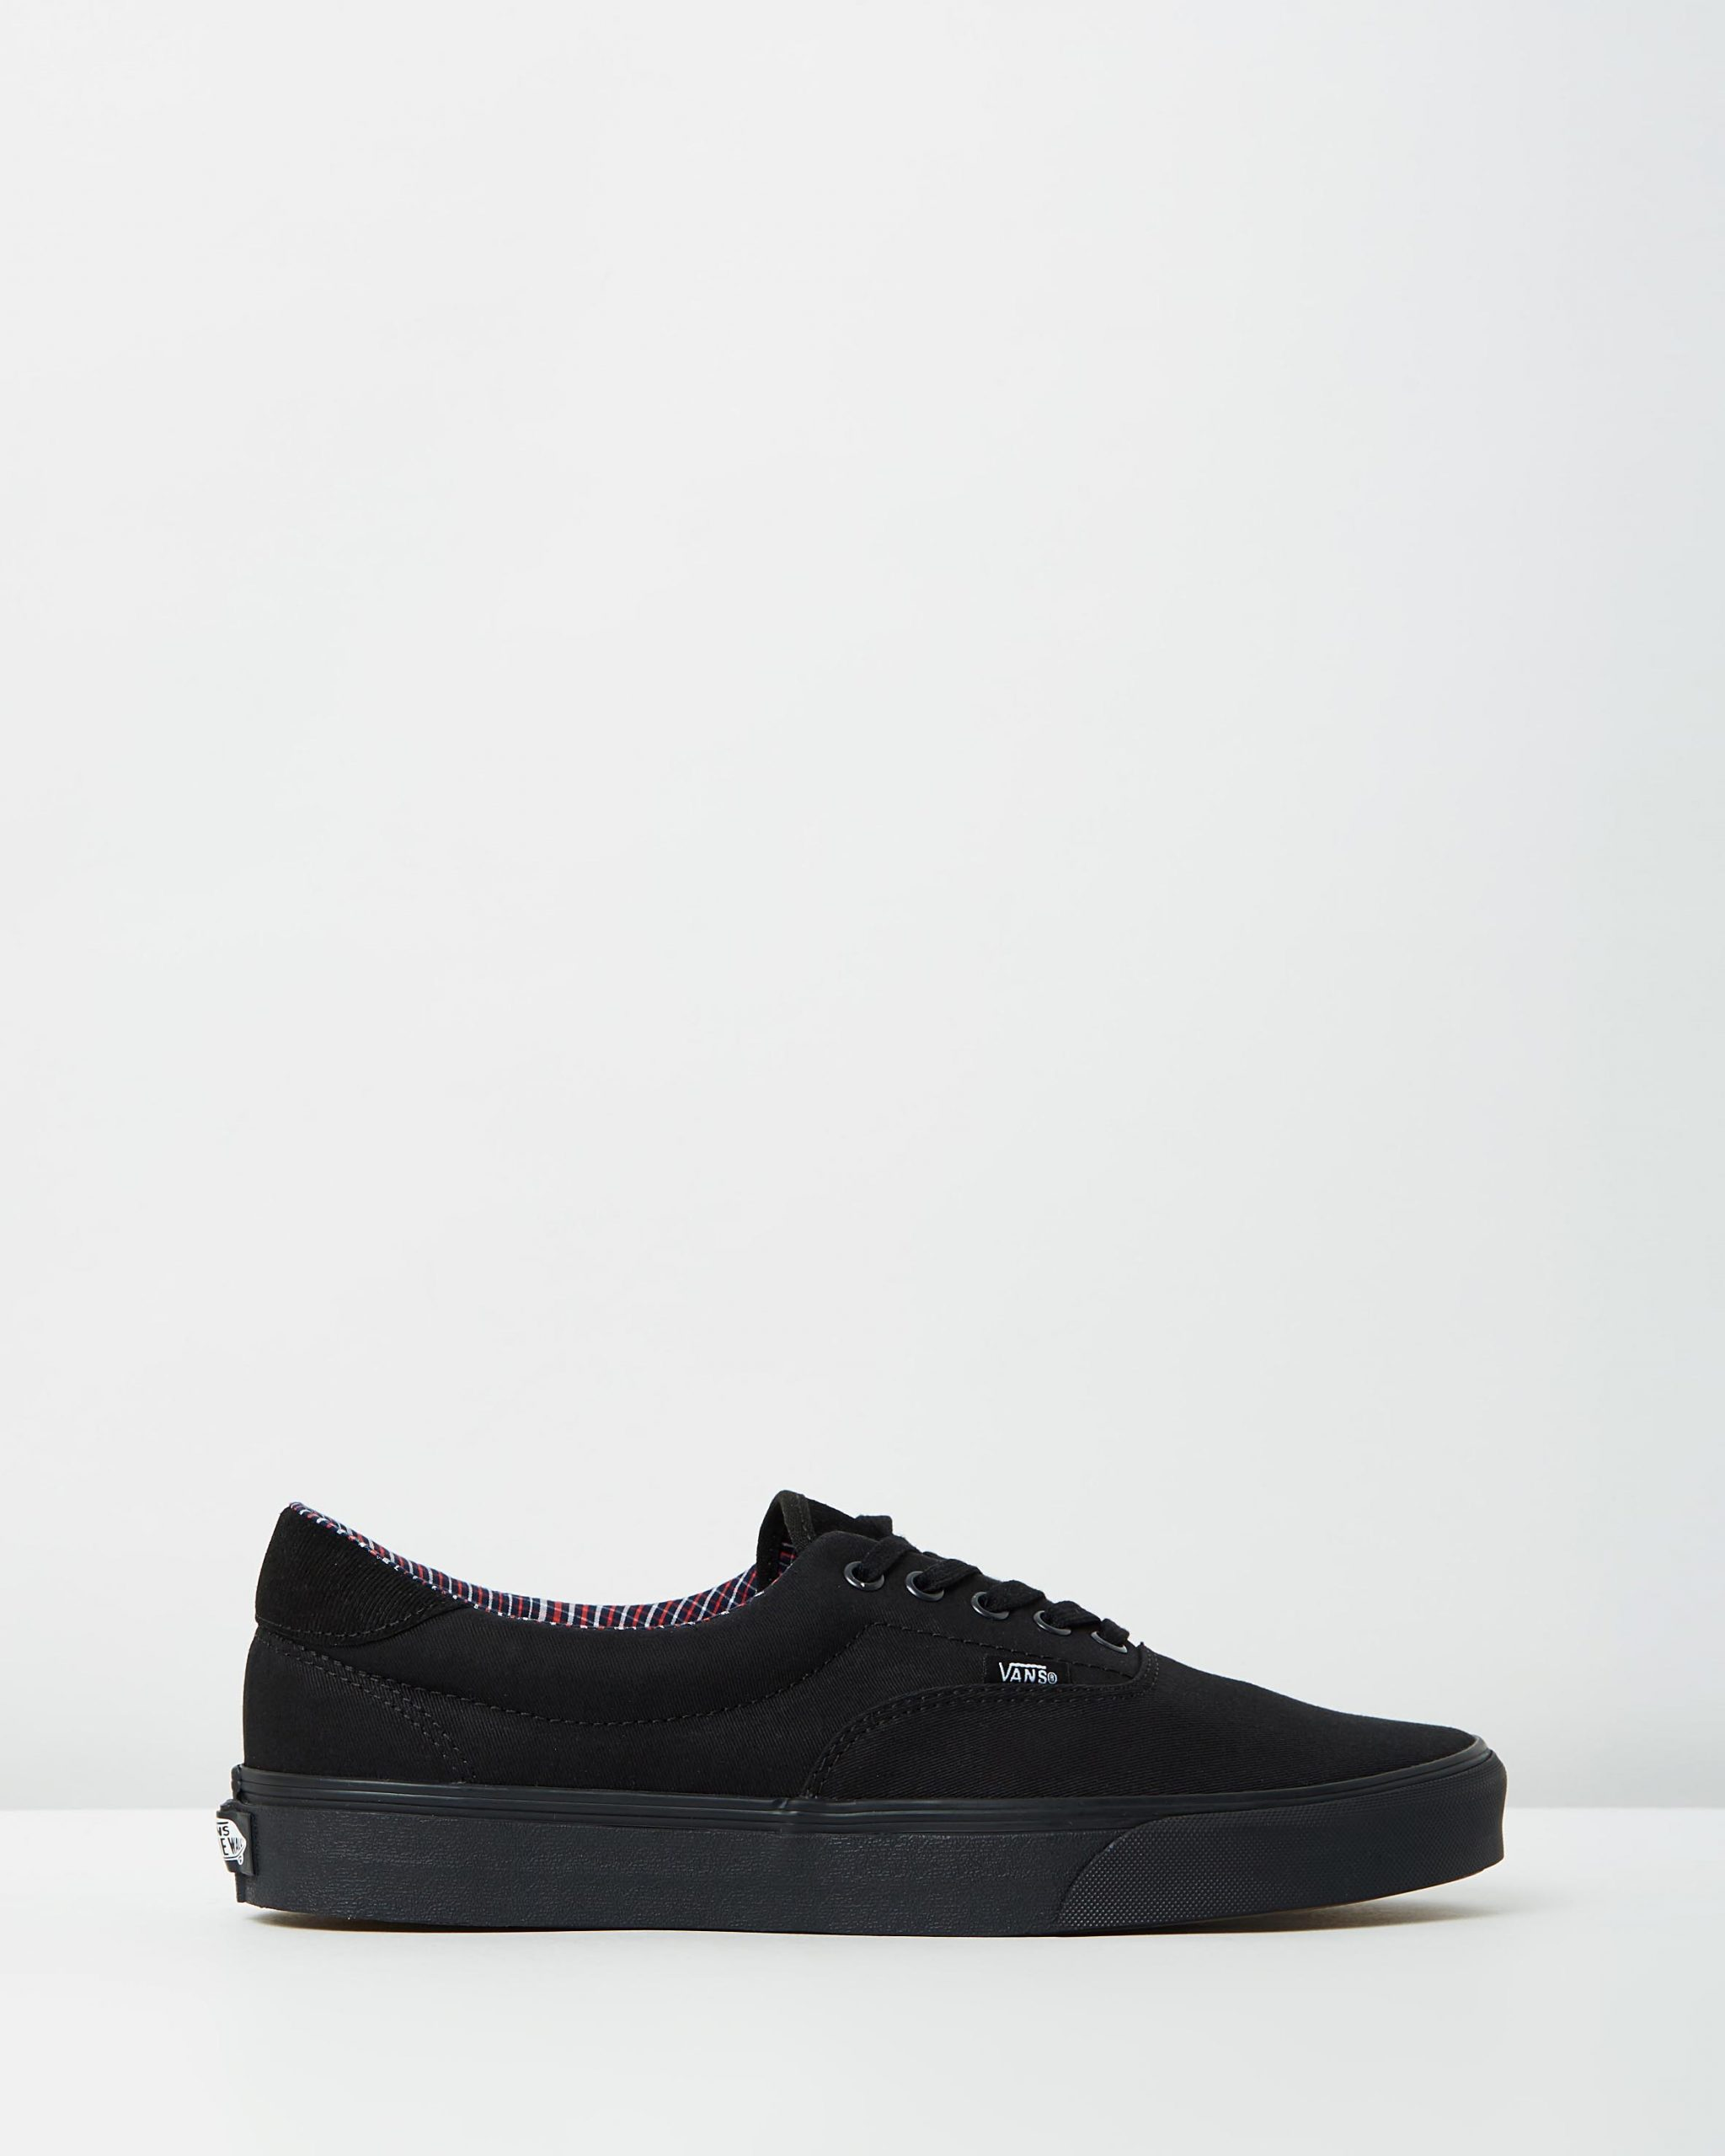 Vans Era 59 Cord, Plaid & Black